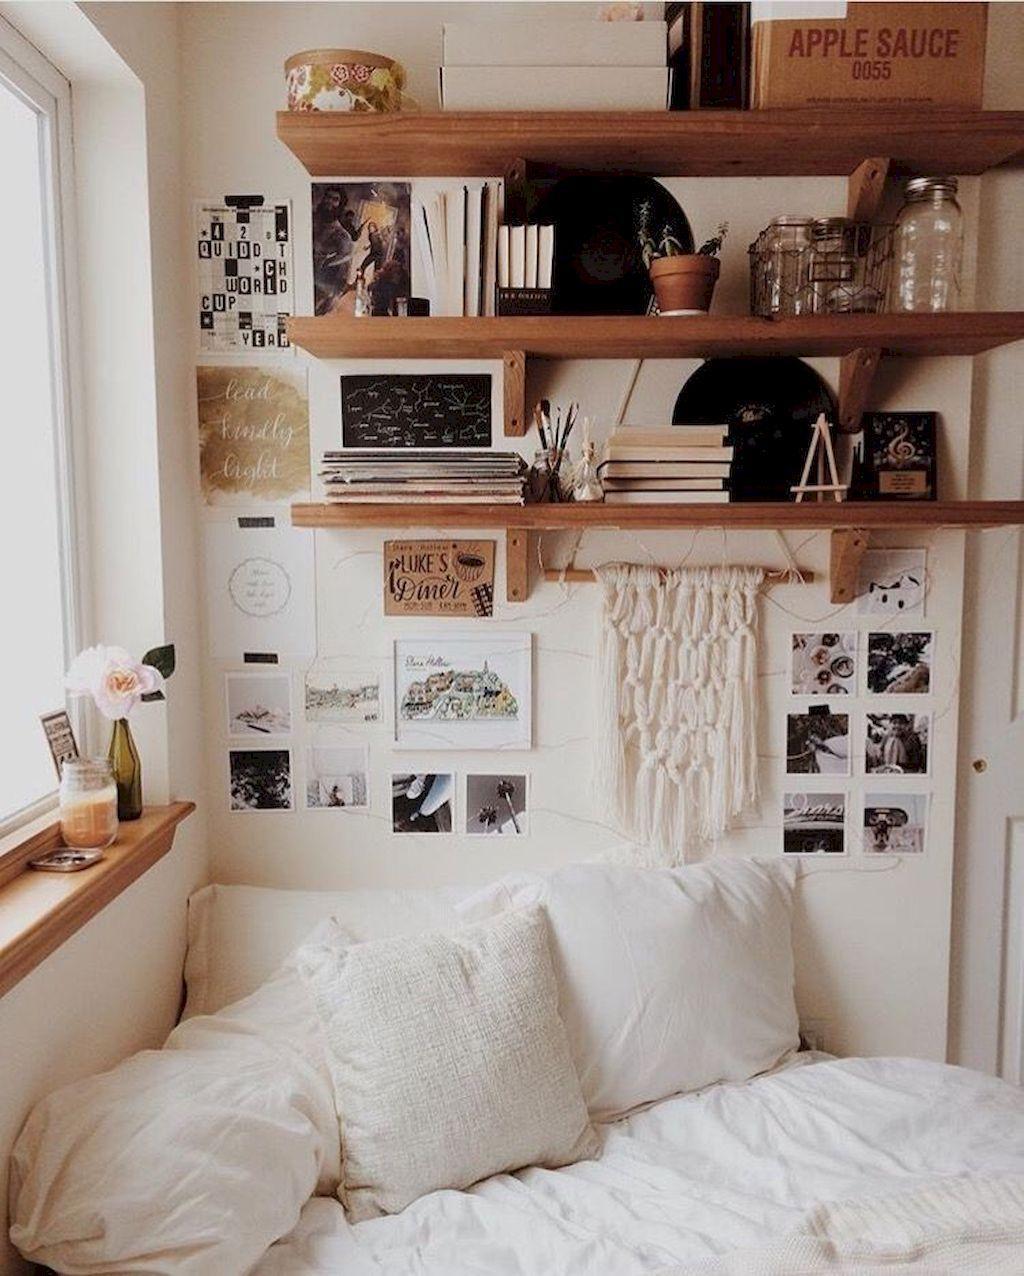 17 Cozy Apartment Bedroom Makeover Decor Ideas Small Bedroom